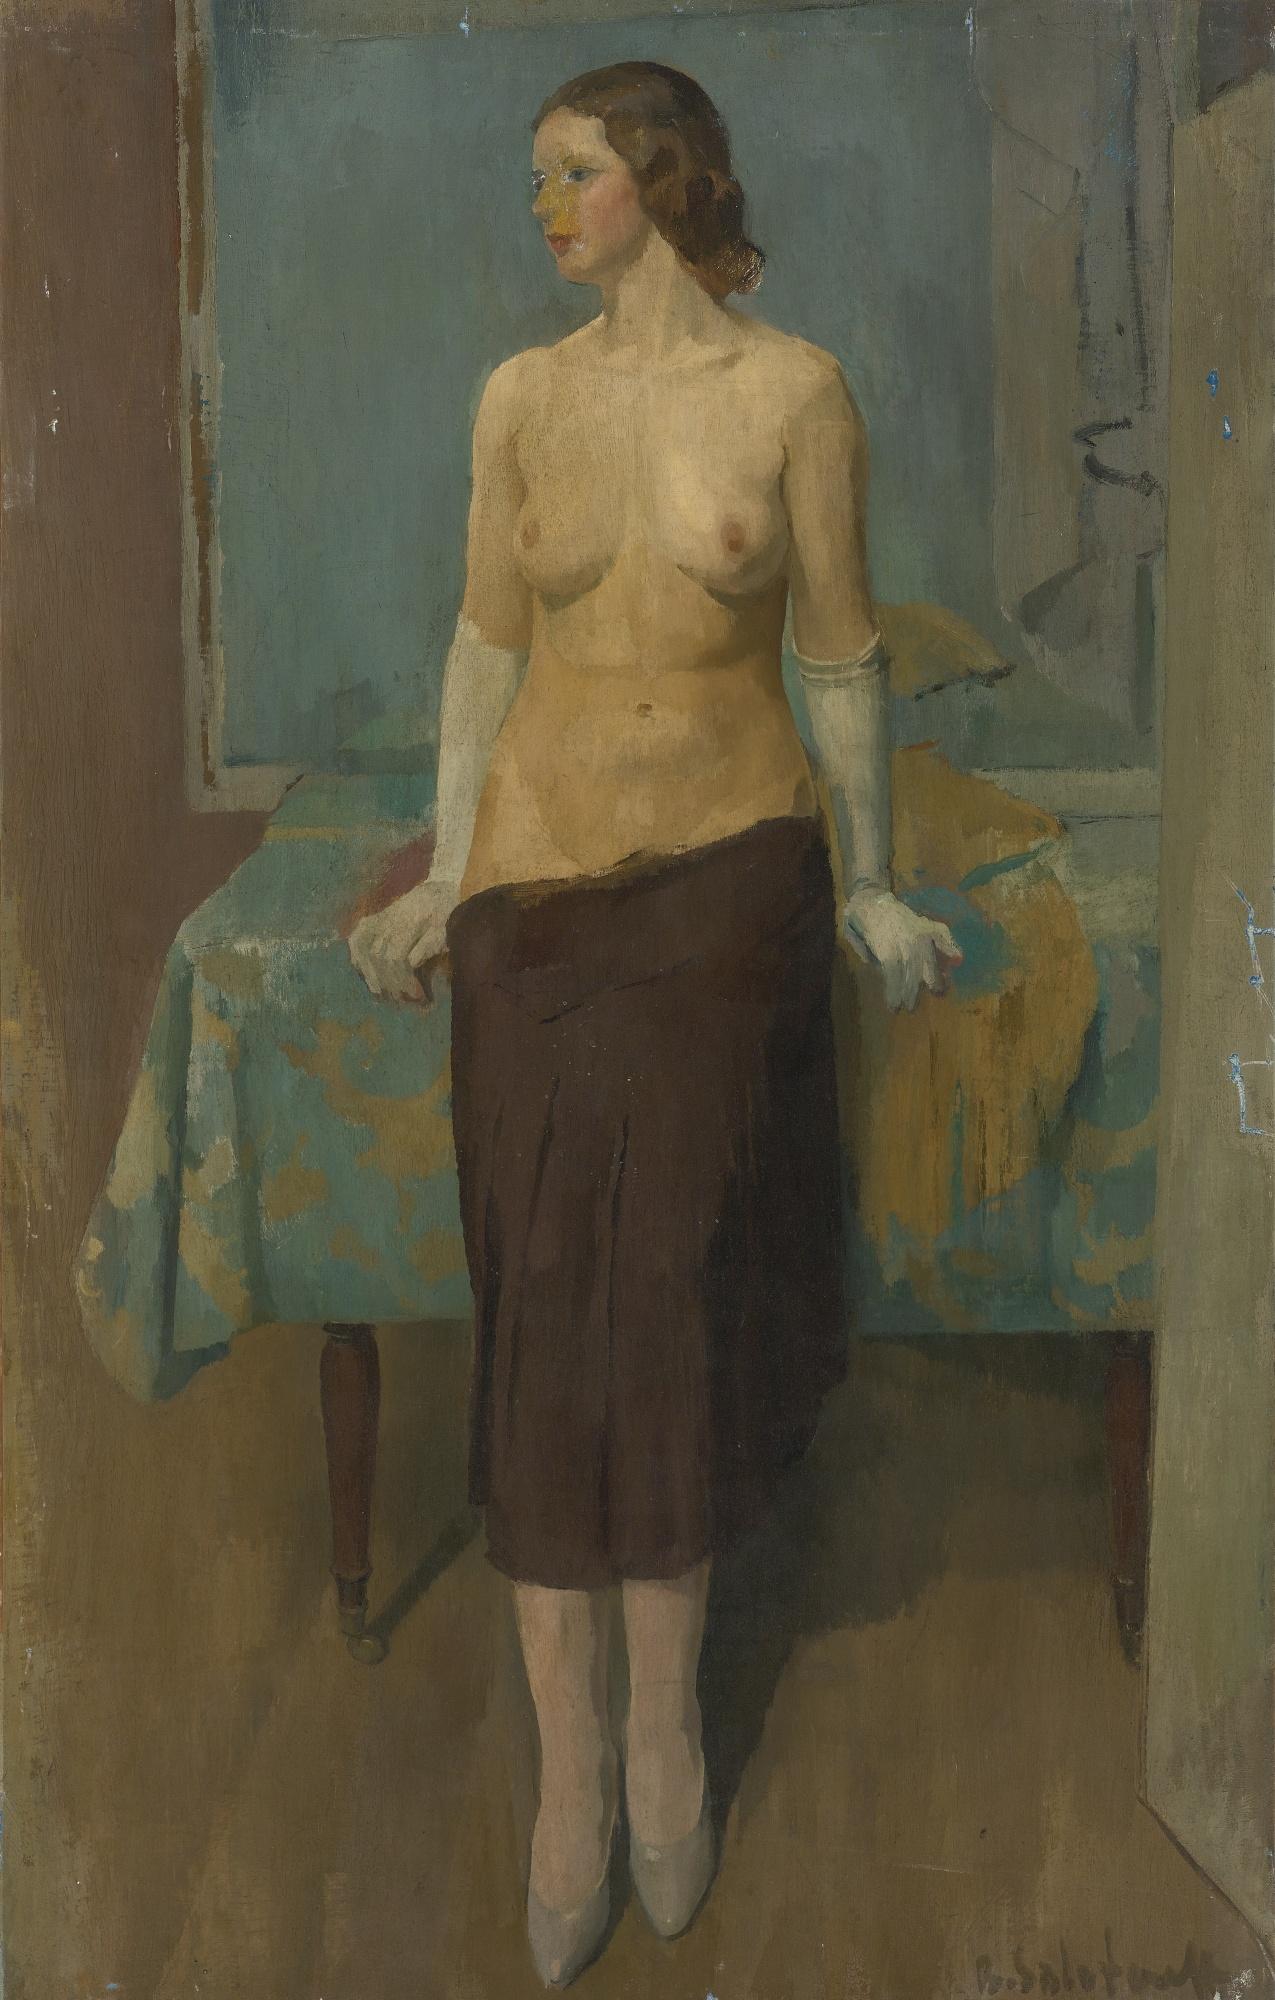 Boris Solotareff, 1889-1966. Обнаженная. 102.5 х 64.5 см. Частная коллекция